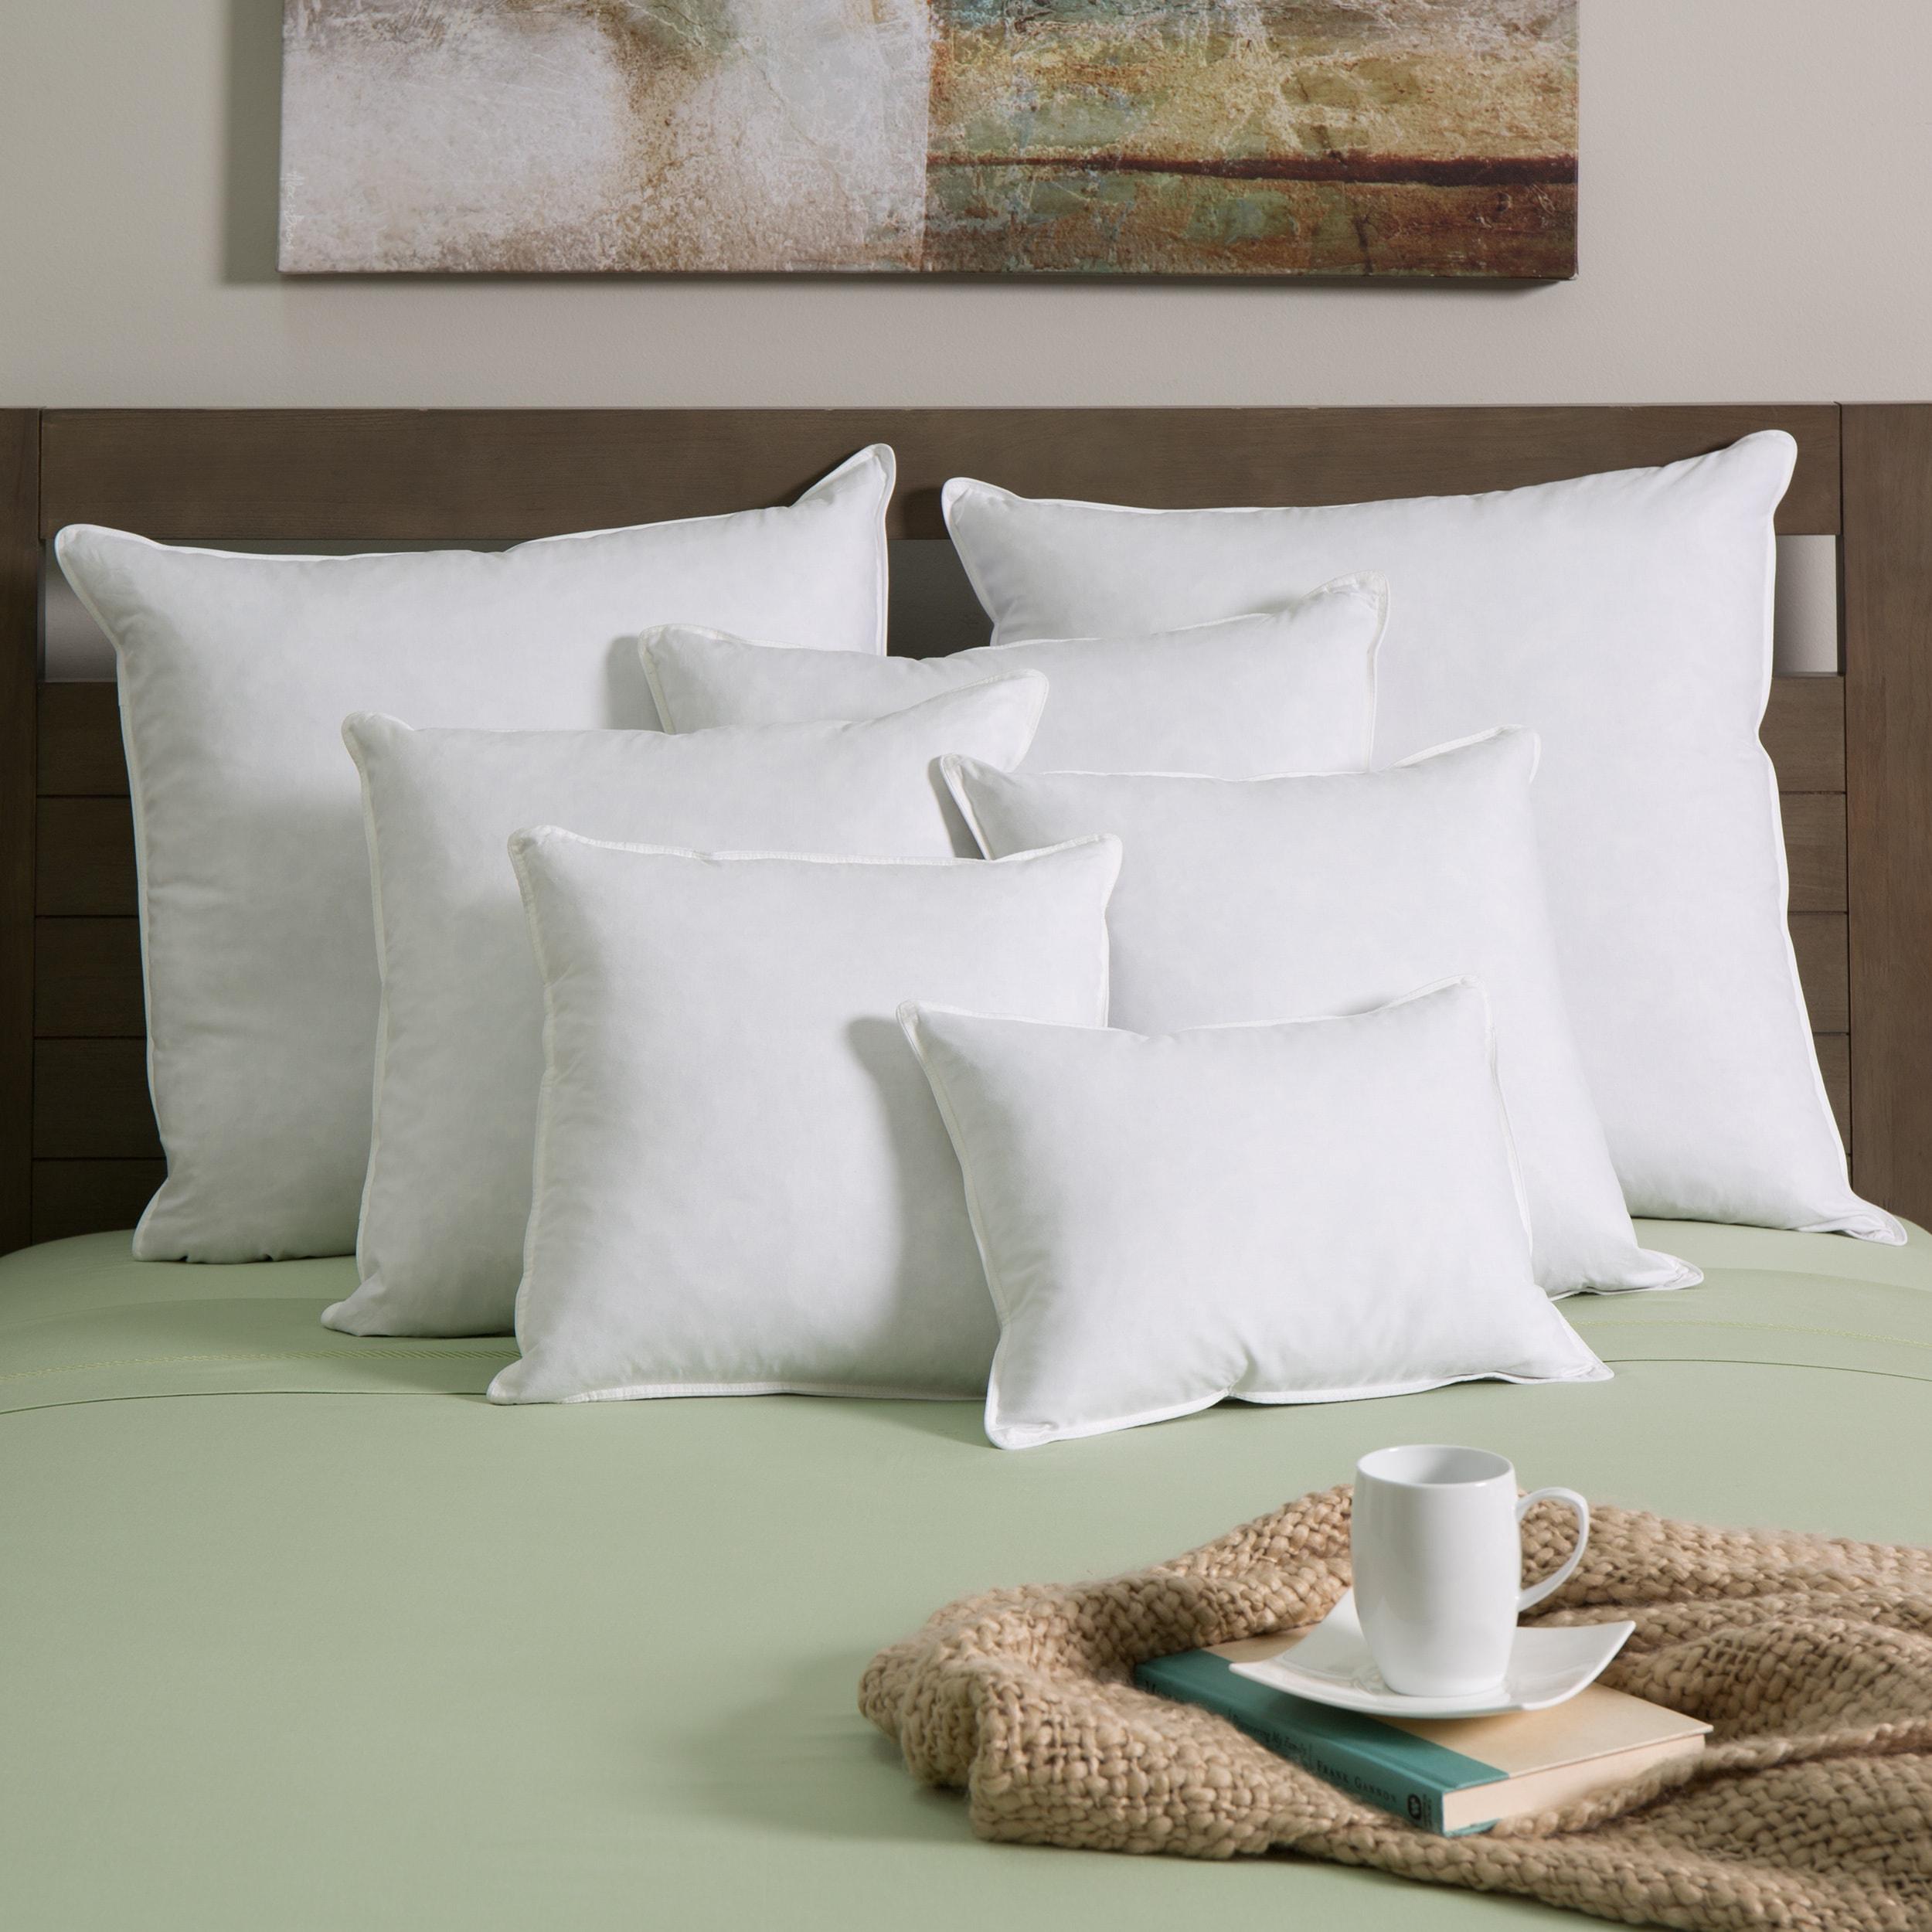 European Heritage White Goose Down And Feather Decor Pillow Insert Set Of 2